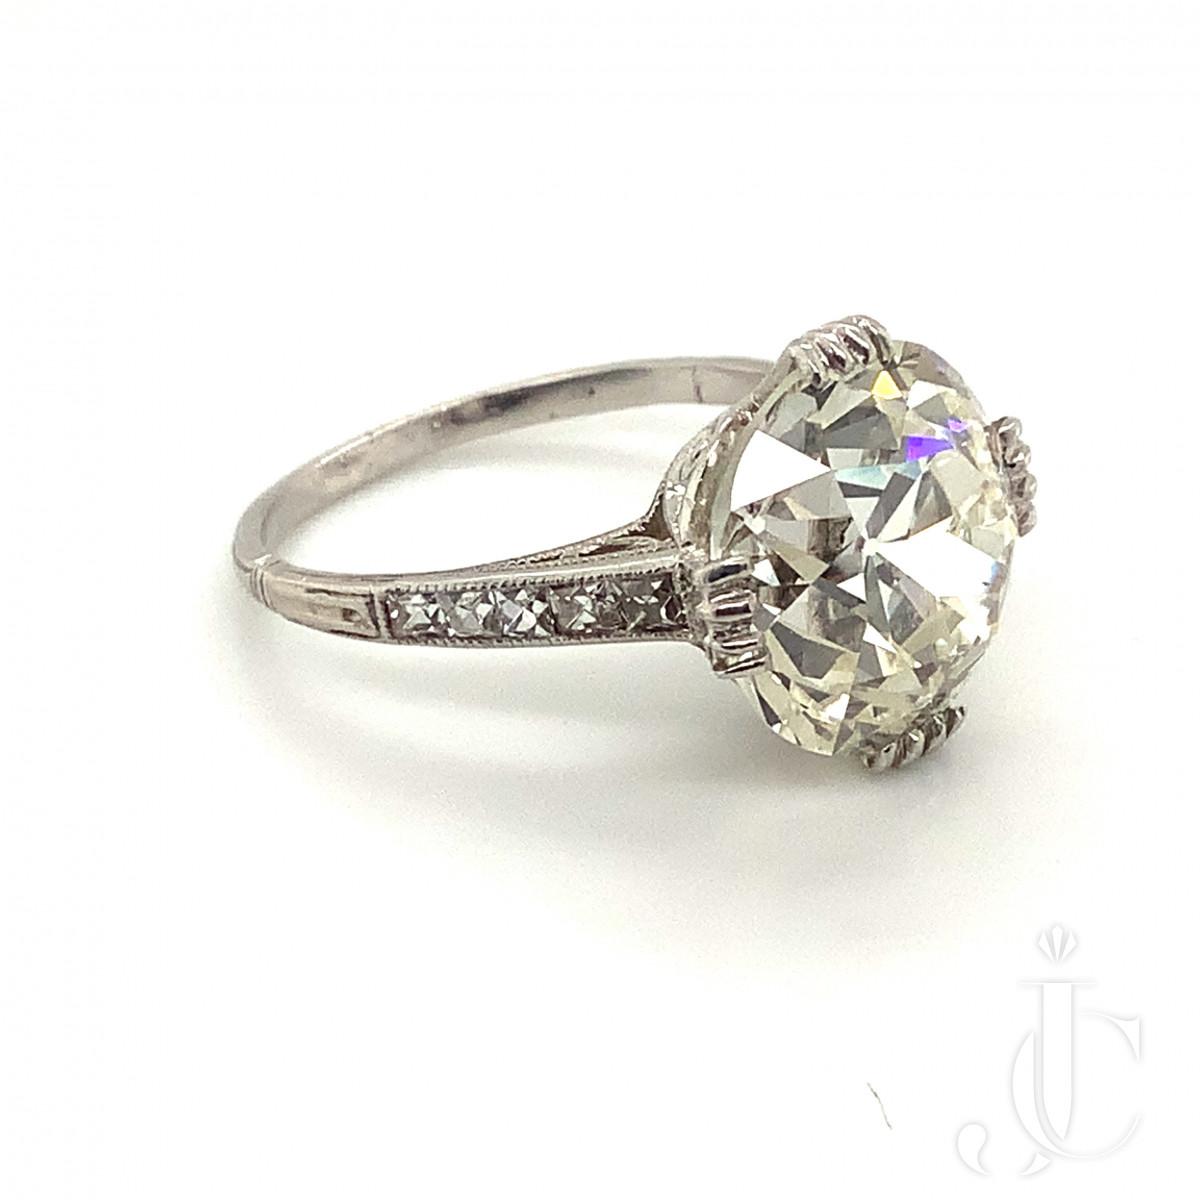 7.55ct Old European Cut Diamond Ring